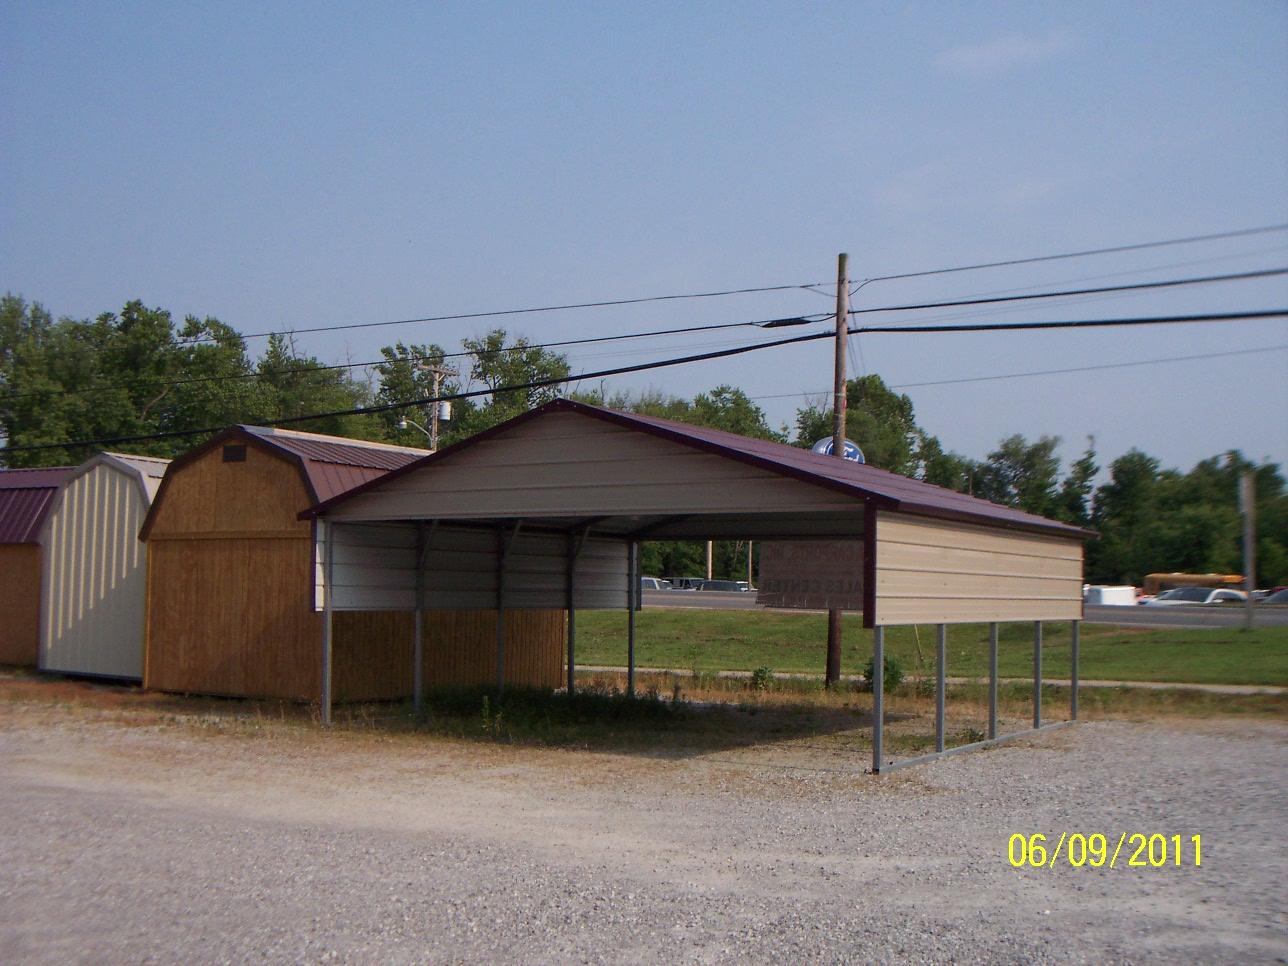 metal more whitesboro integrity mckinney buildings and car tx sheds etc denton carports garages by sherman garage